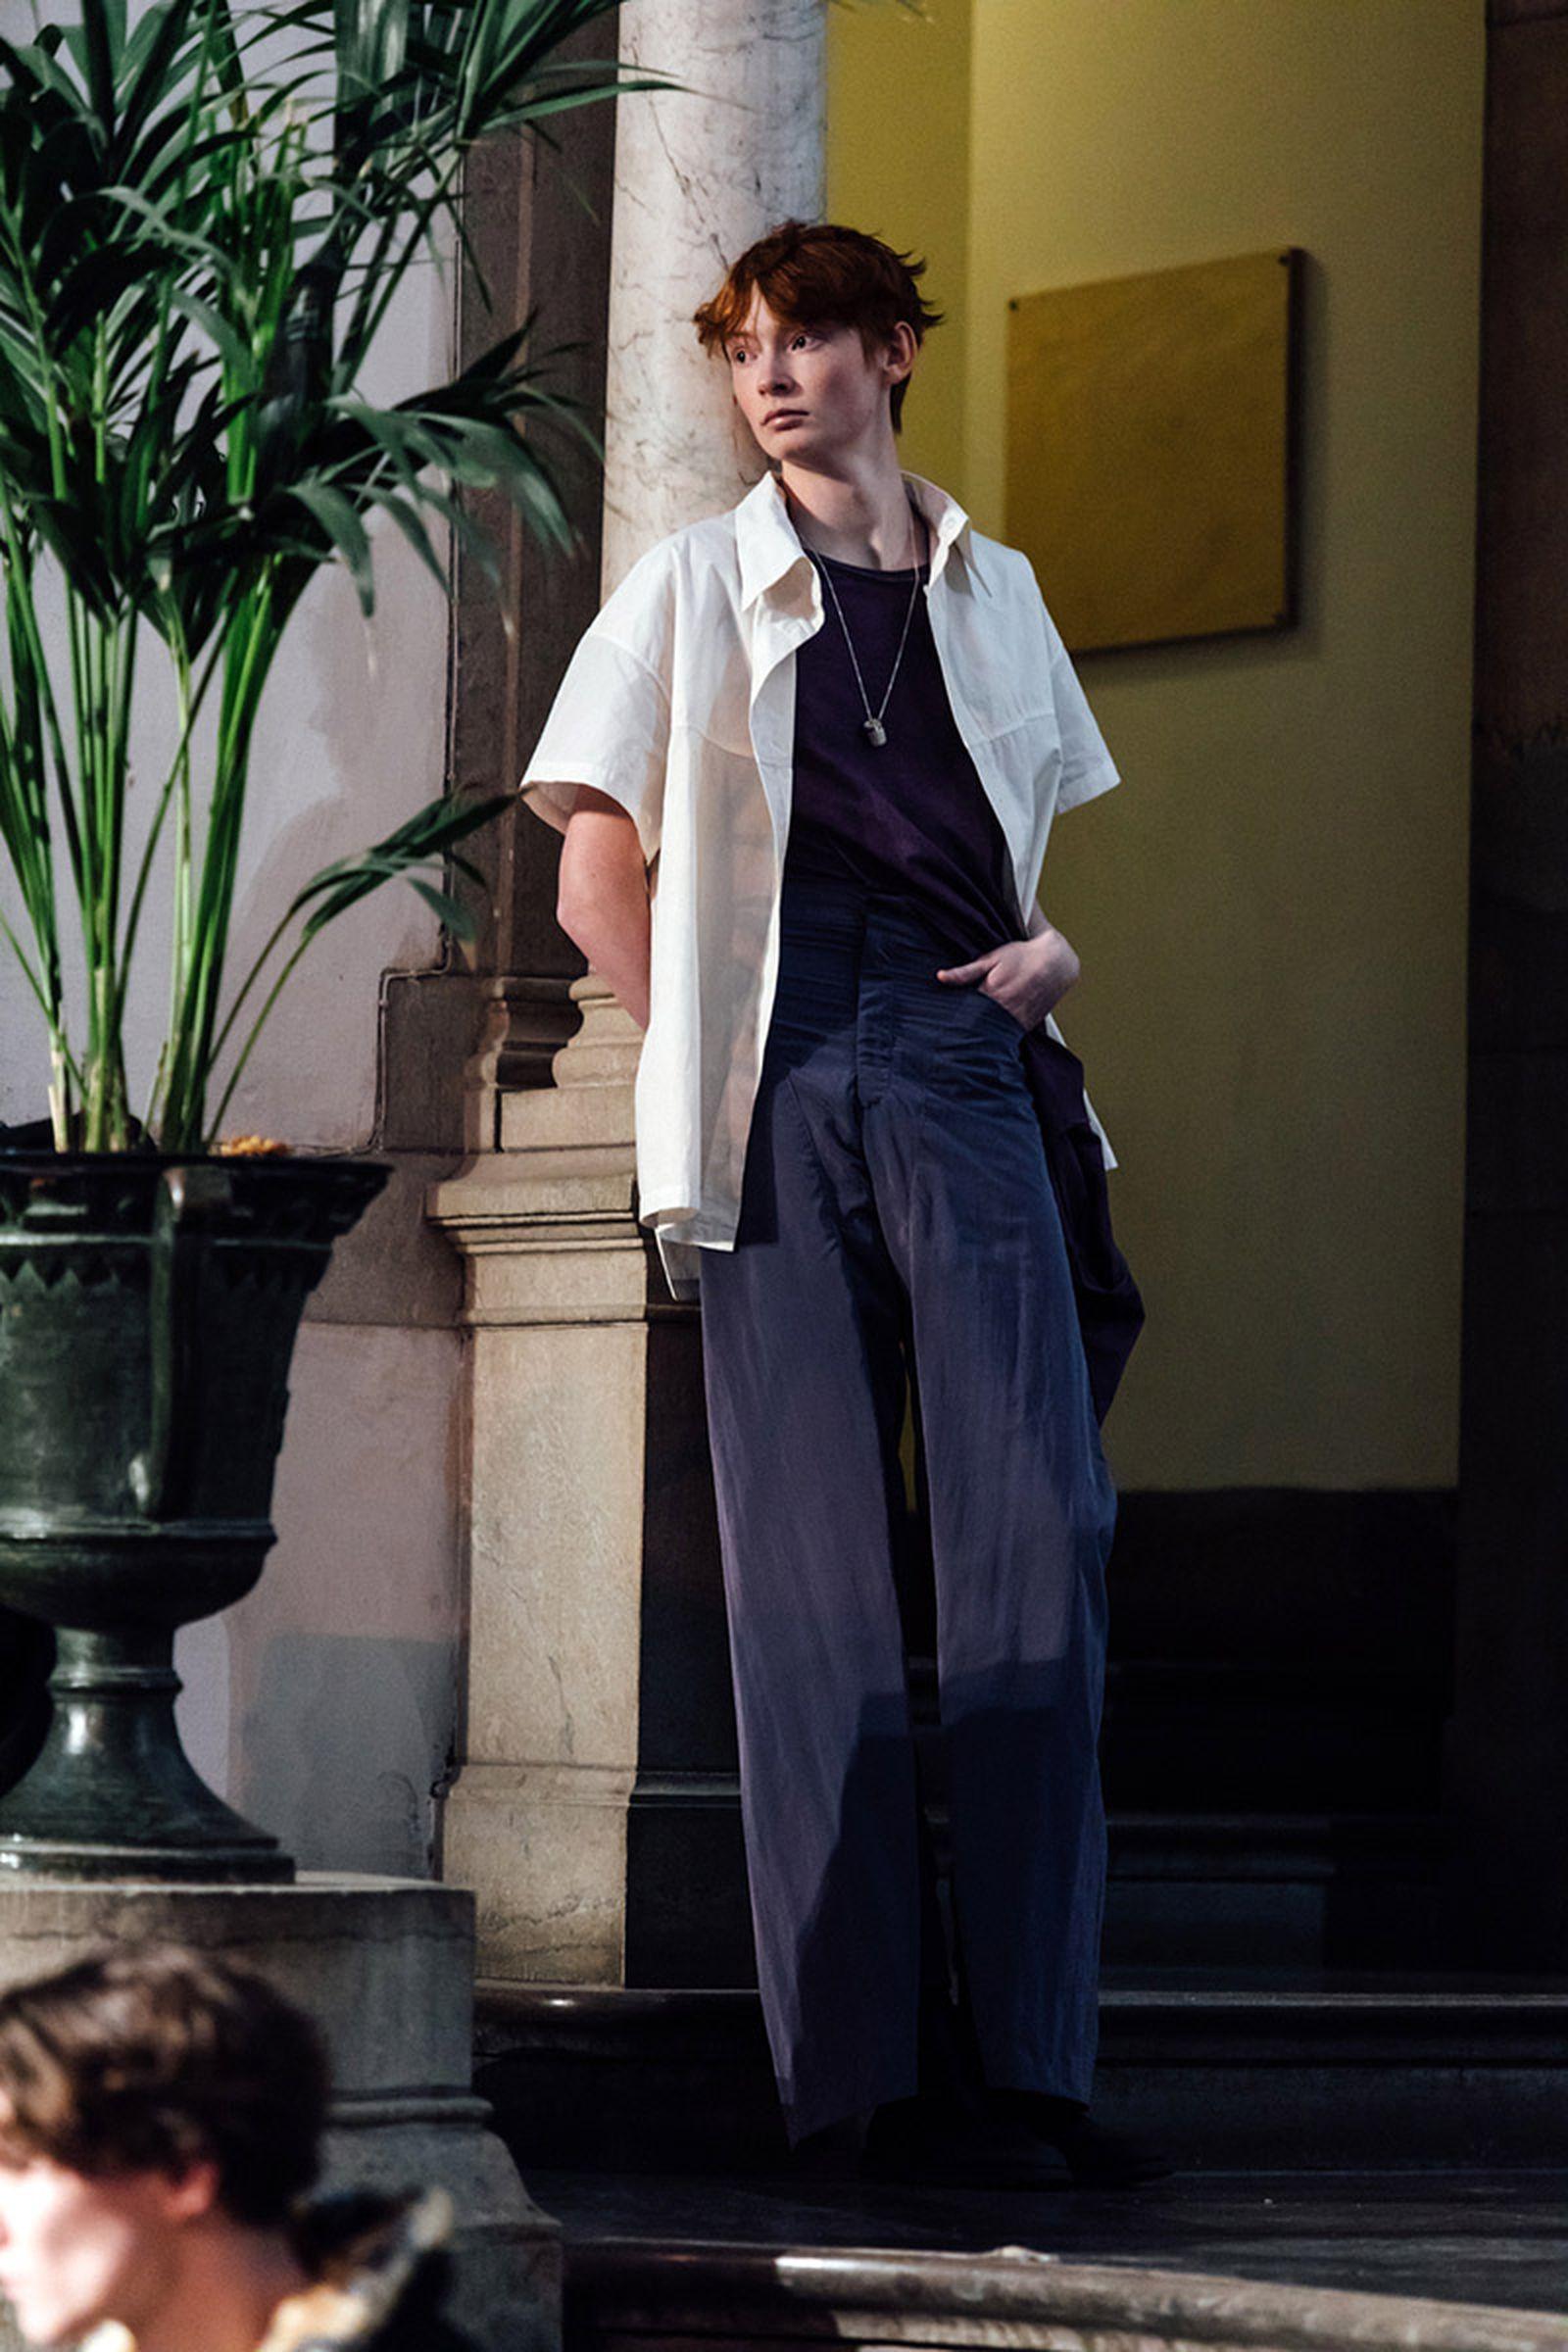 stockholm fashion week fw19 roundup Per Gotesson Scandinavian Man Selam Fessahaye